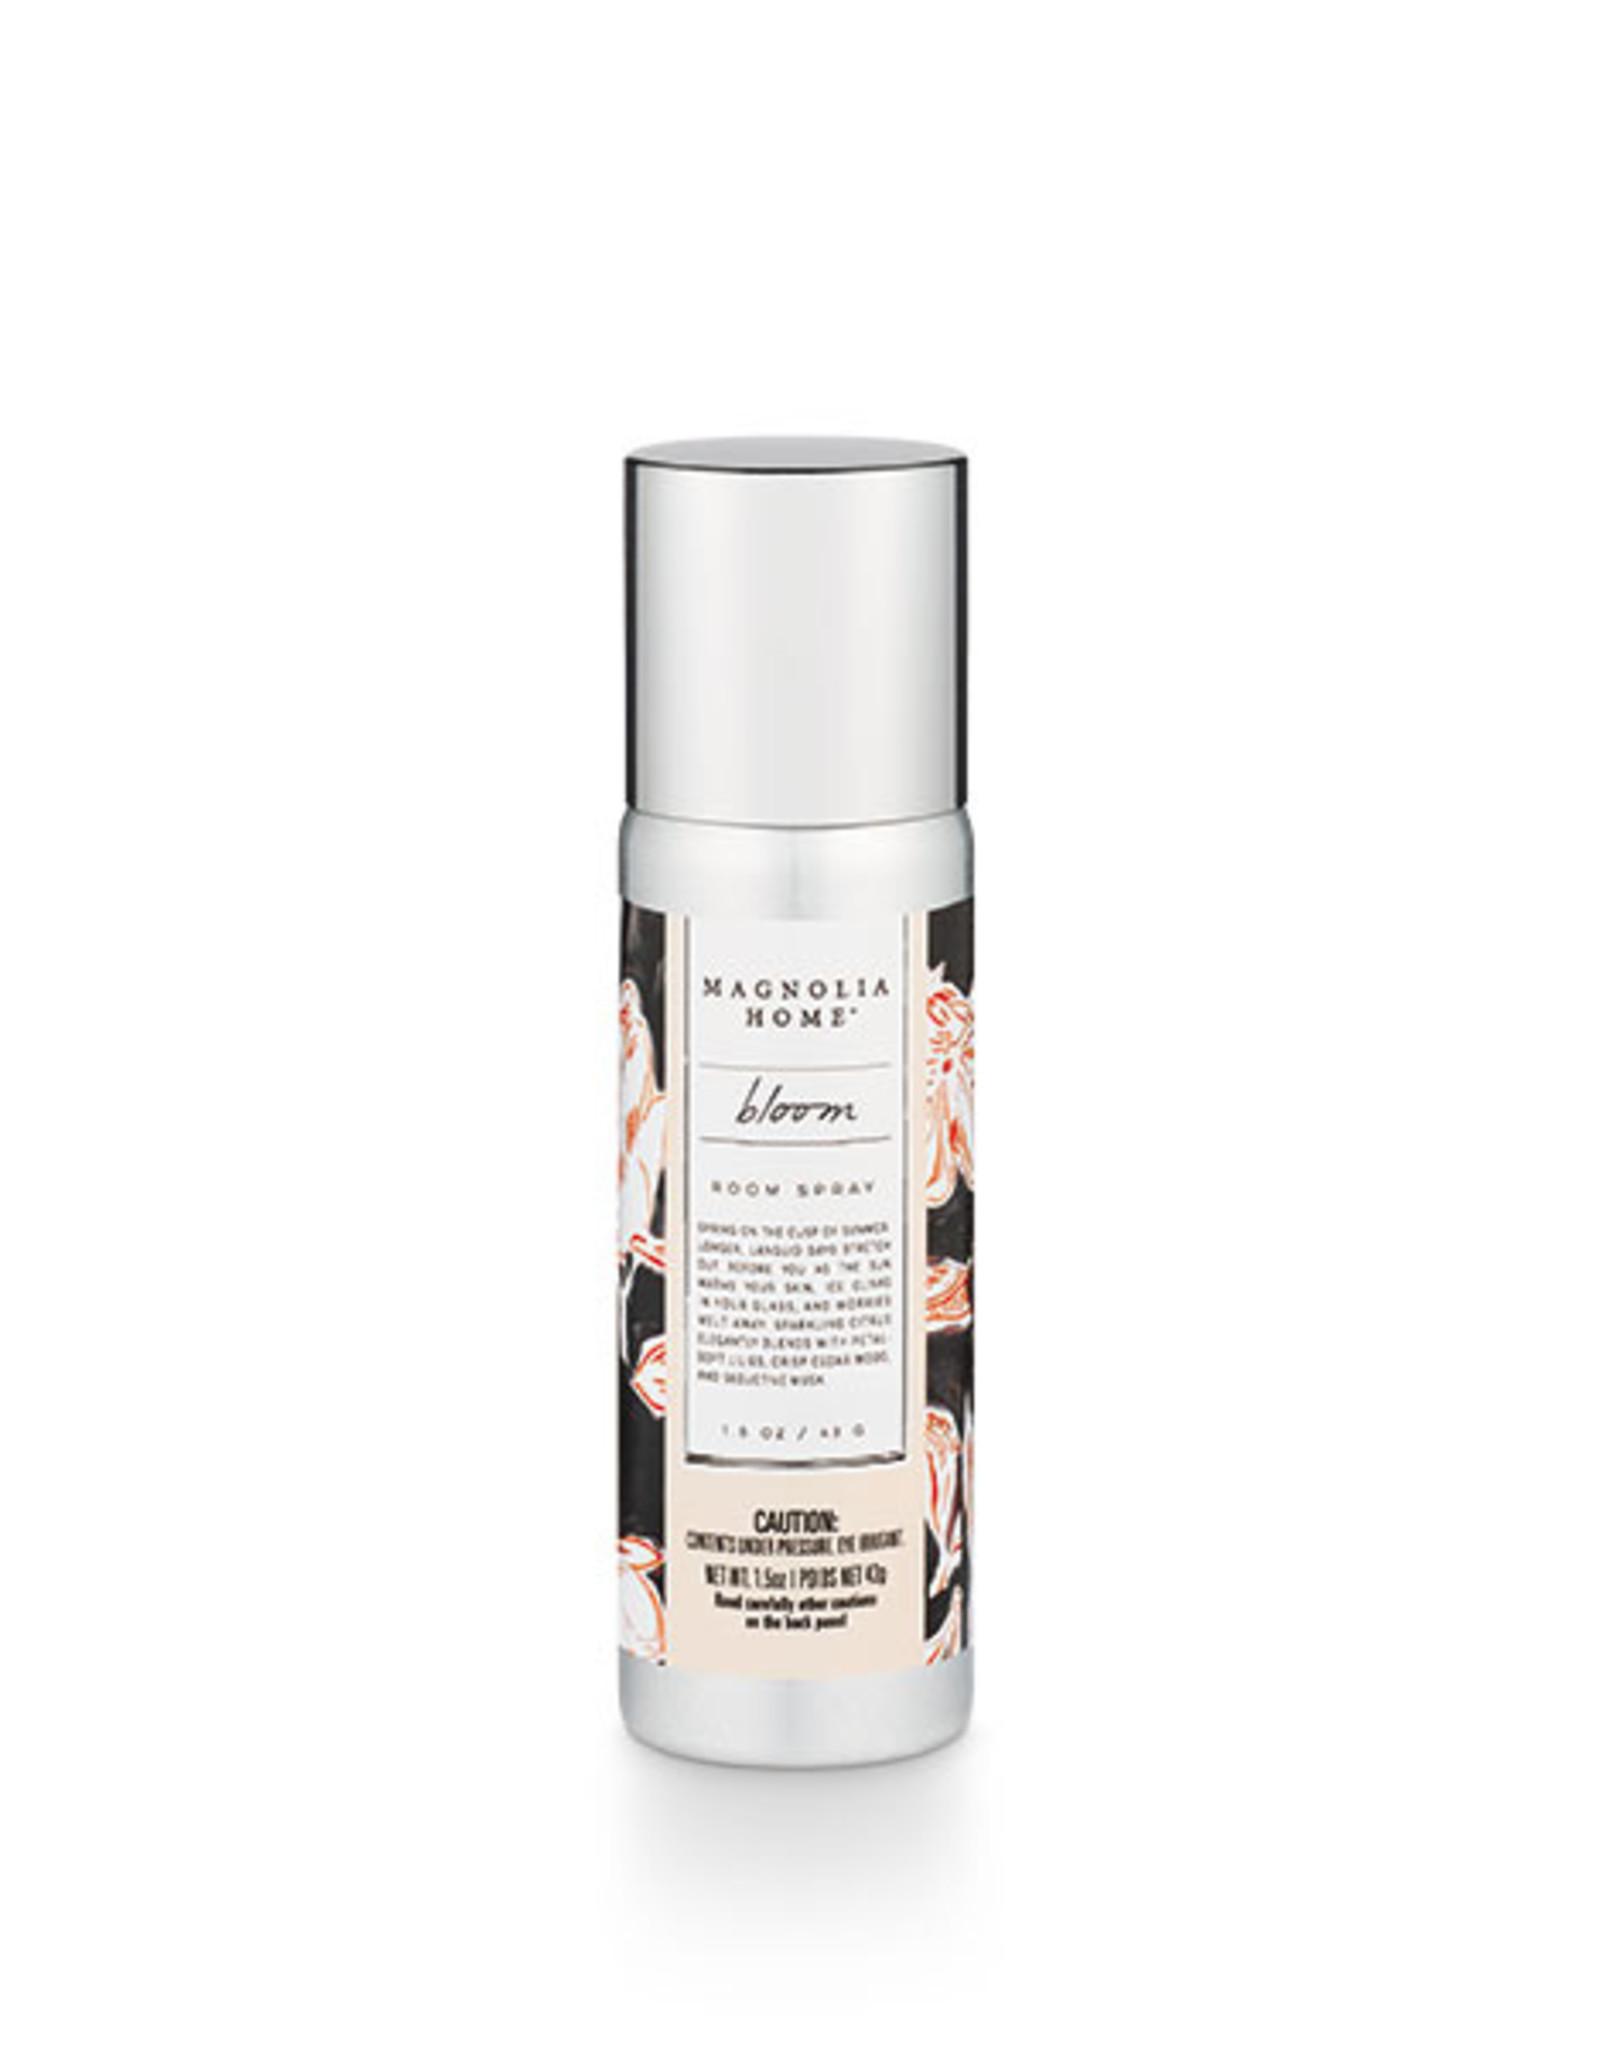 Magnolia Home - Bloom Scent Room Spray